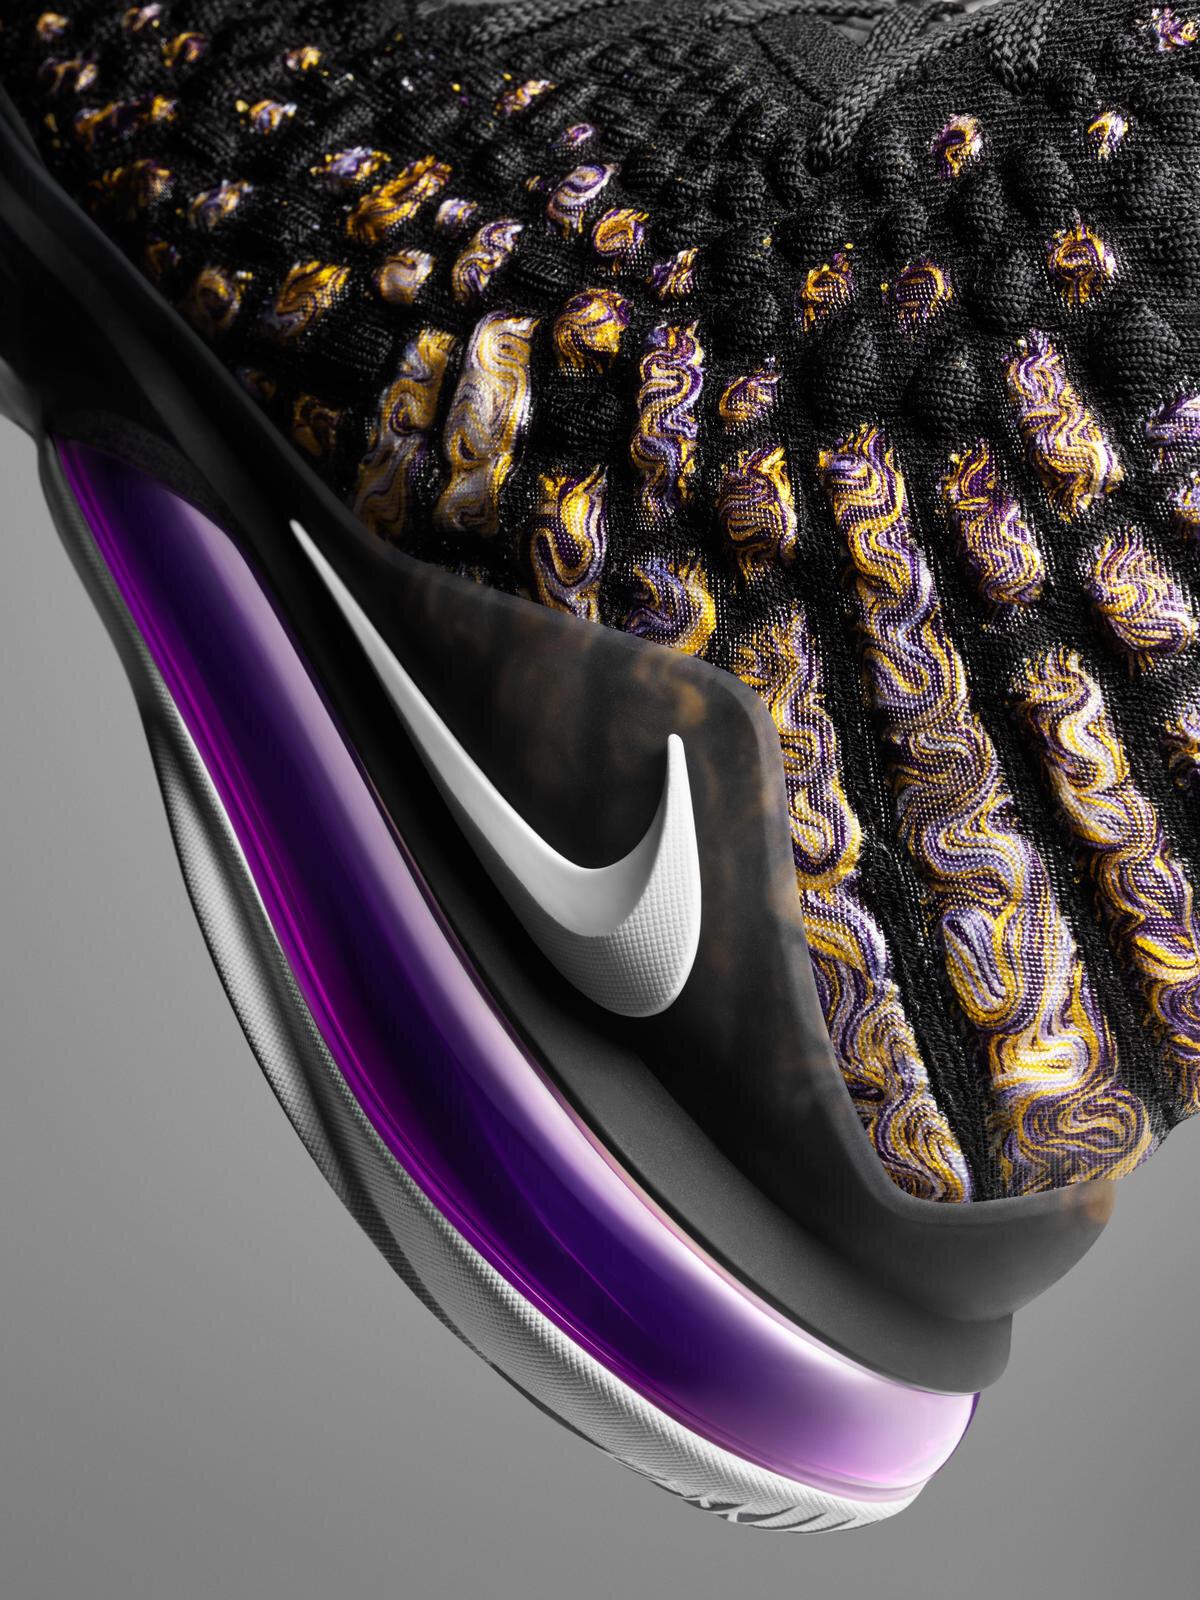 NikeNews_HO19_BB_LeBron17_Purple_Gold_Airbag_90402.jpg